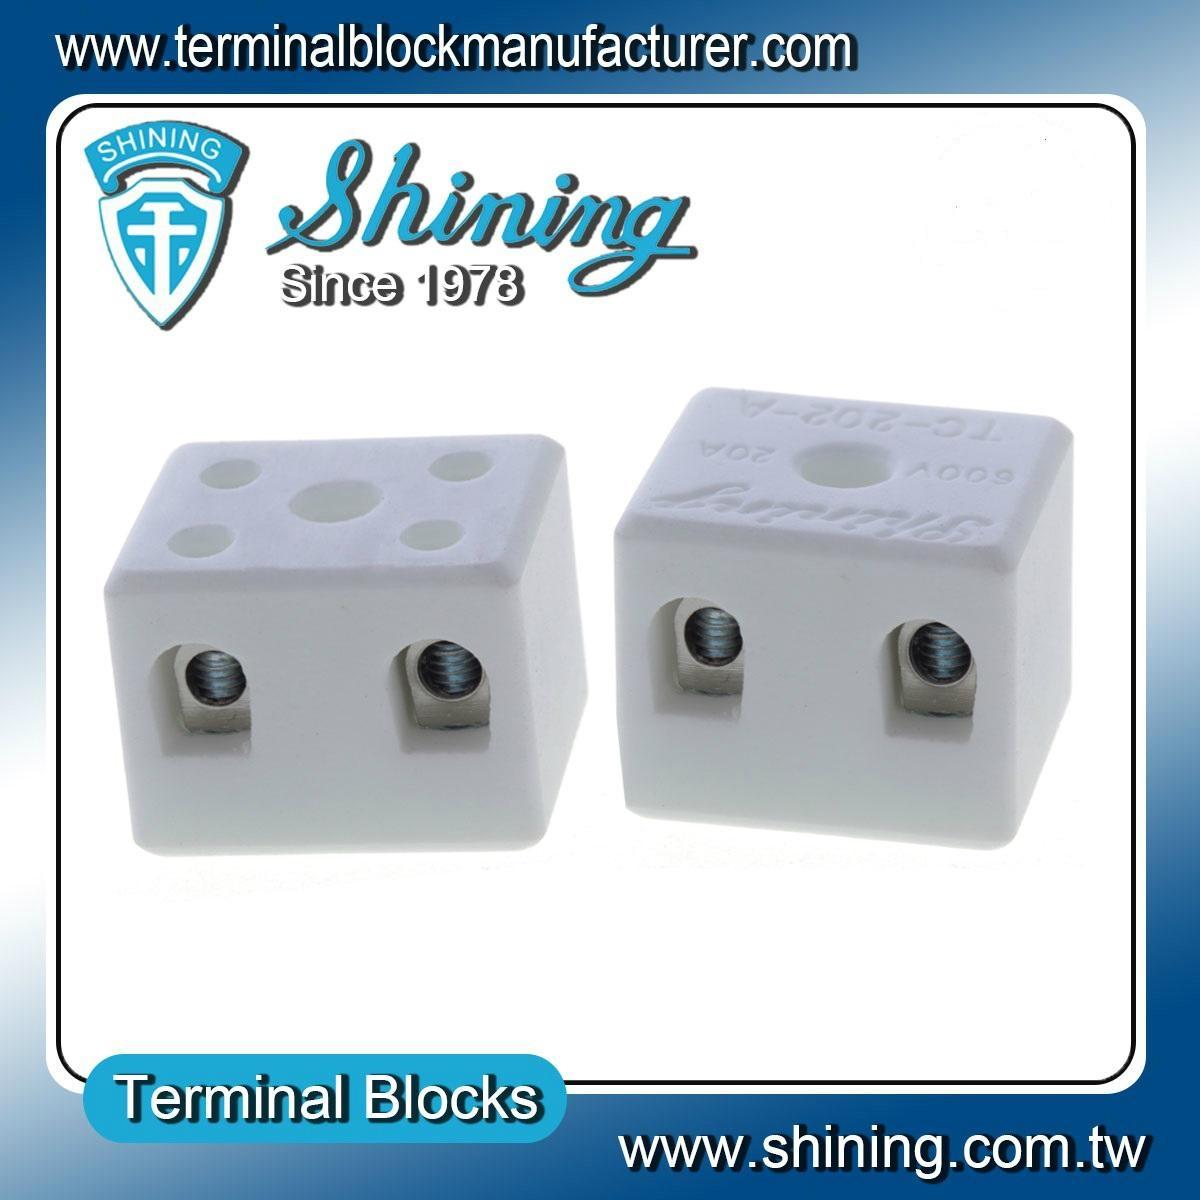 TC-202-A 陶瓷端子台 Ceramic Terminal Block 2